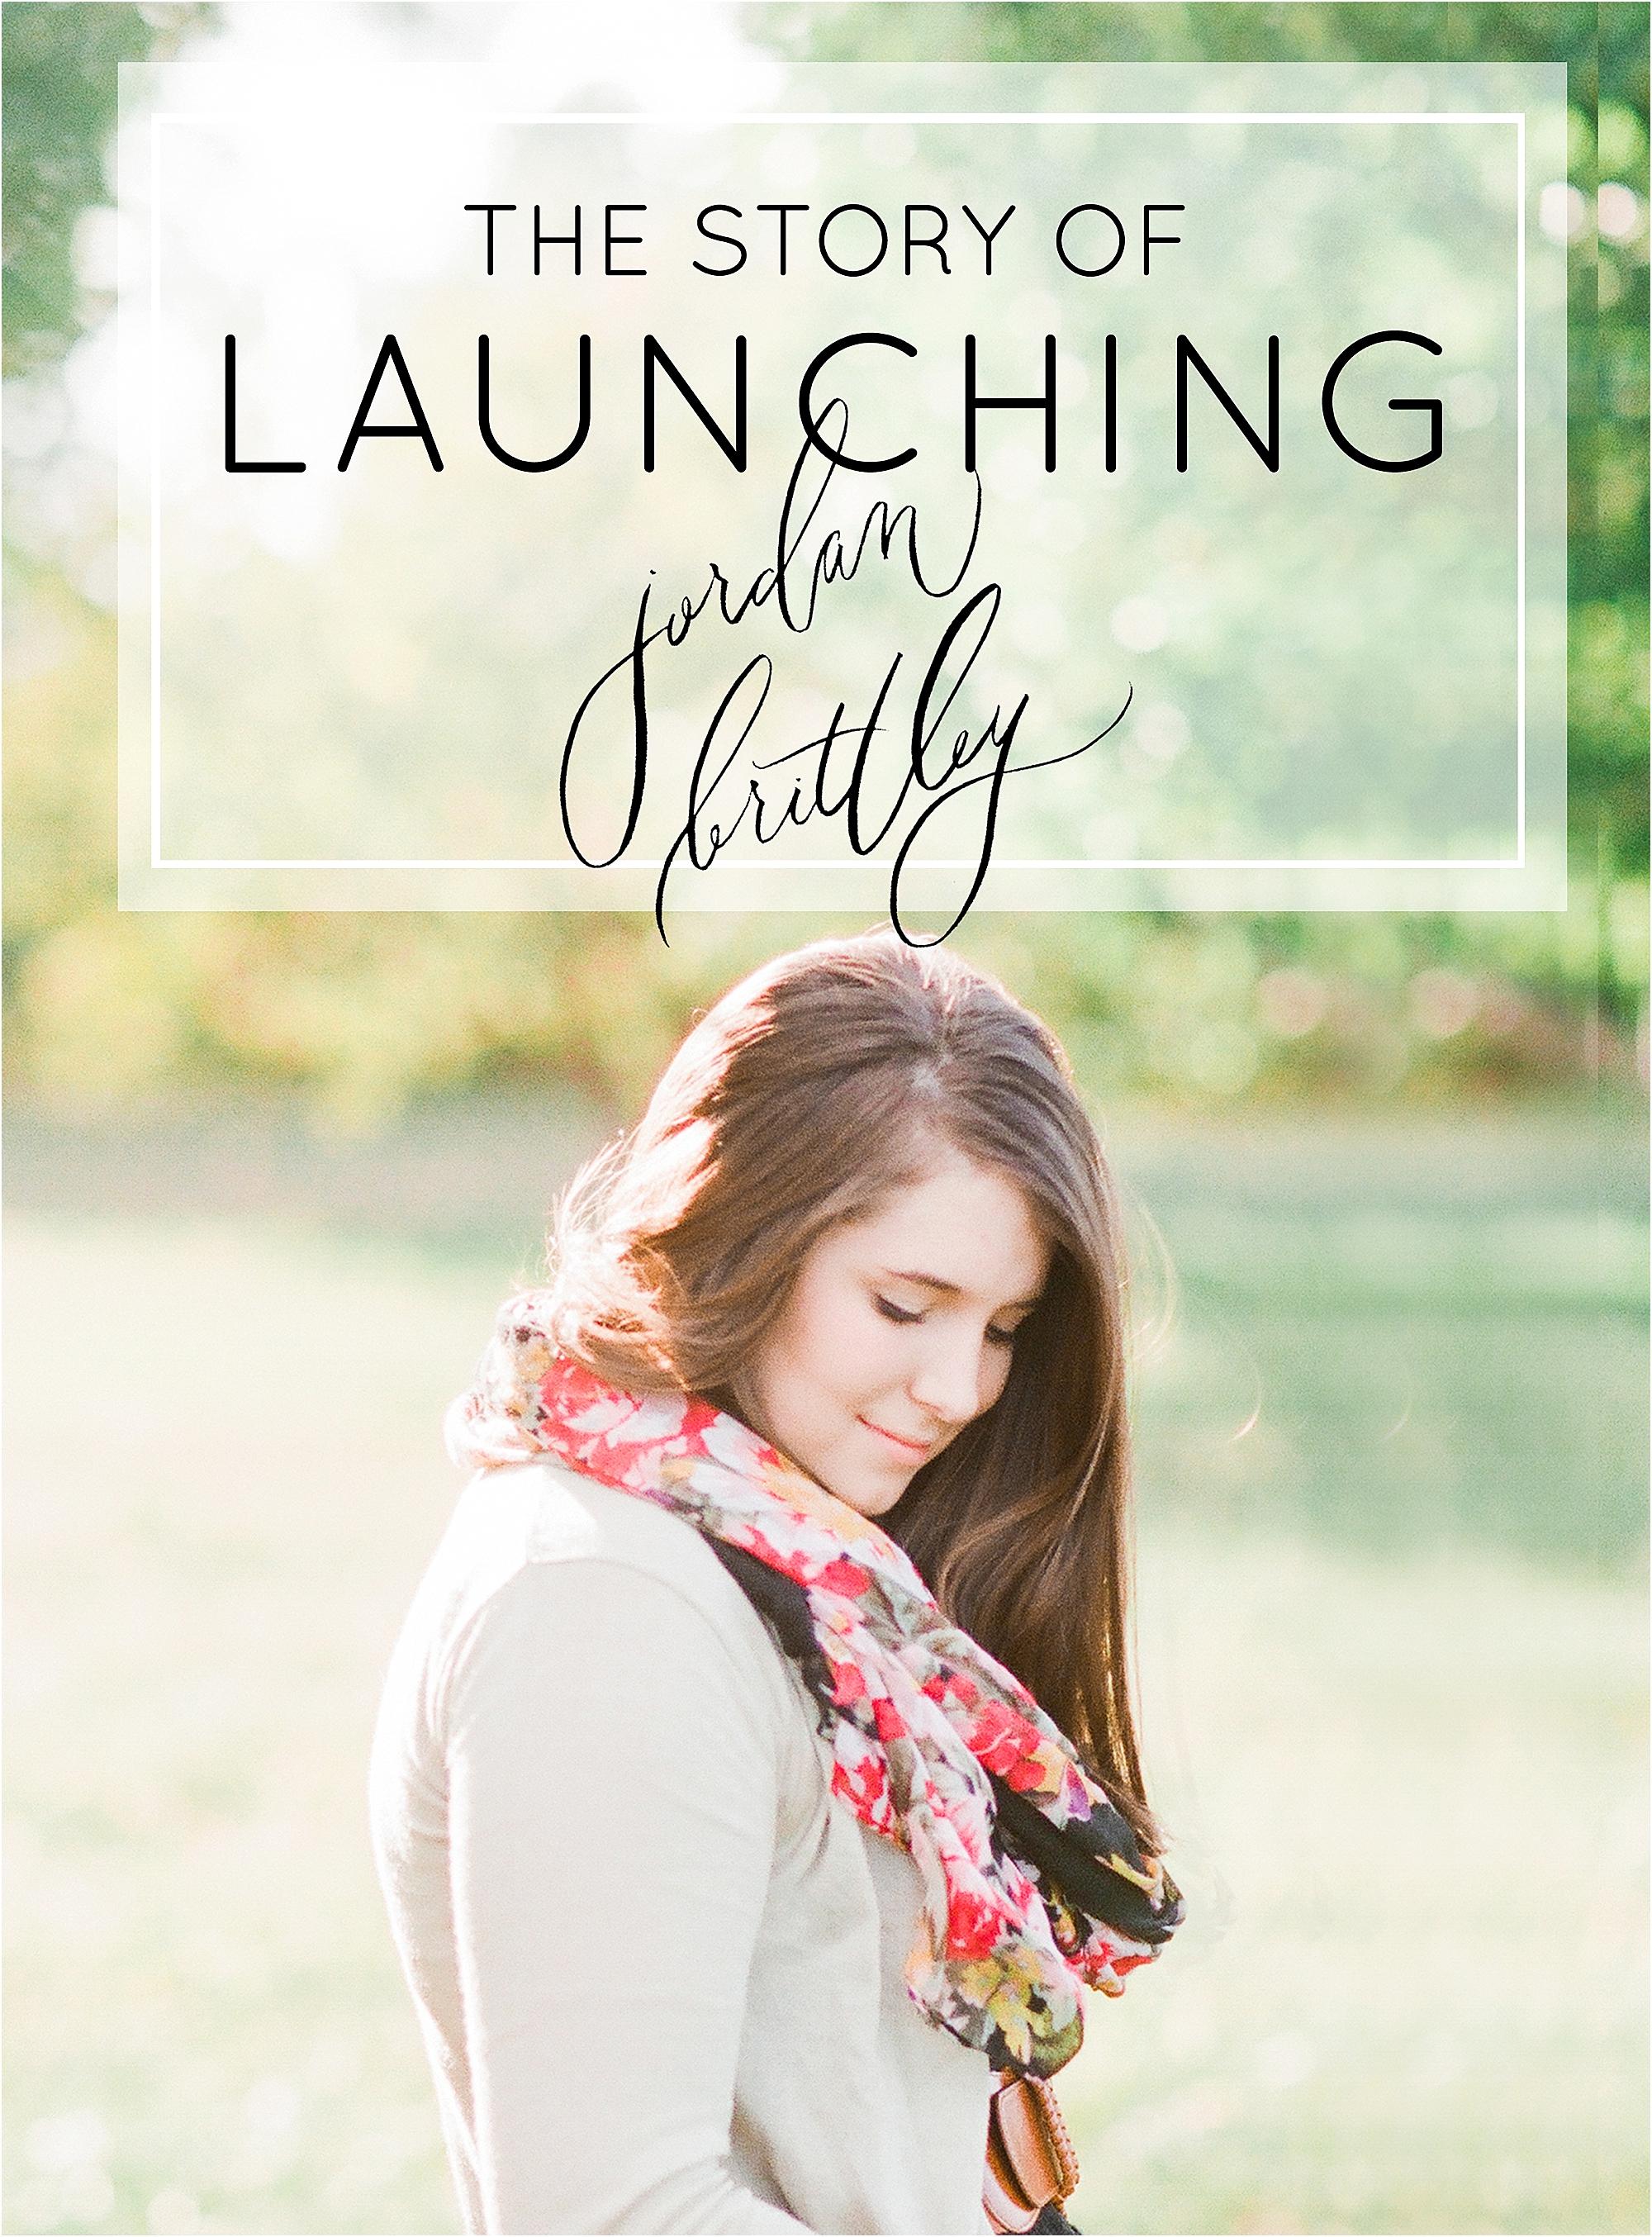 The Story of Launching Jordan Brittley - The Jordan Brittley Blog